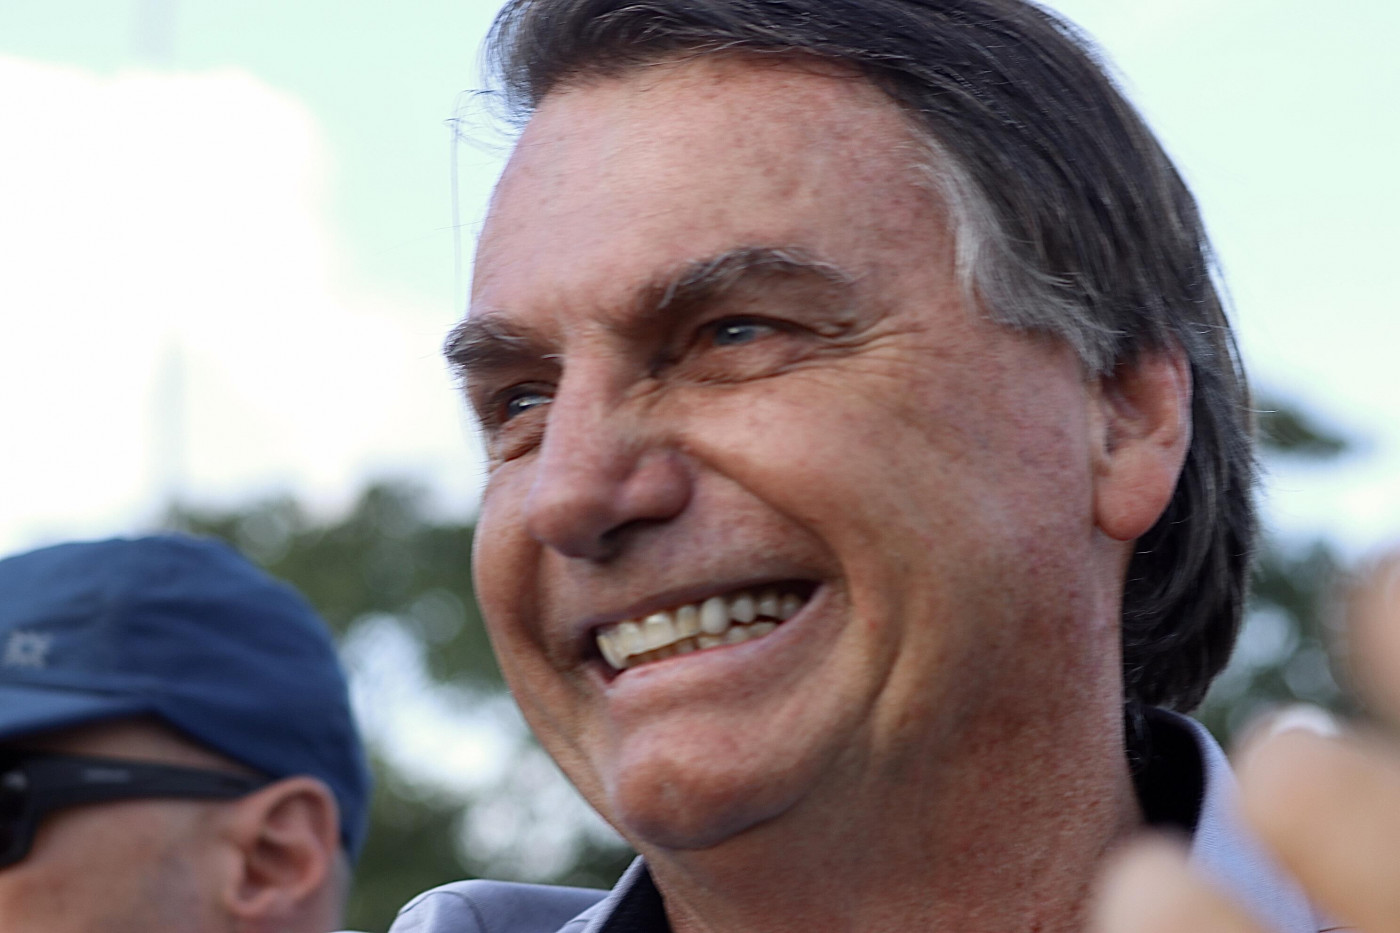 Imagem do presidente Jair Bolsonaro sorrindo